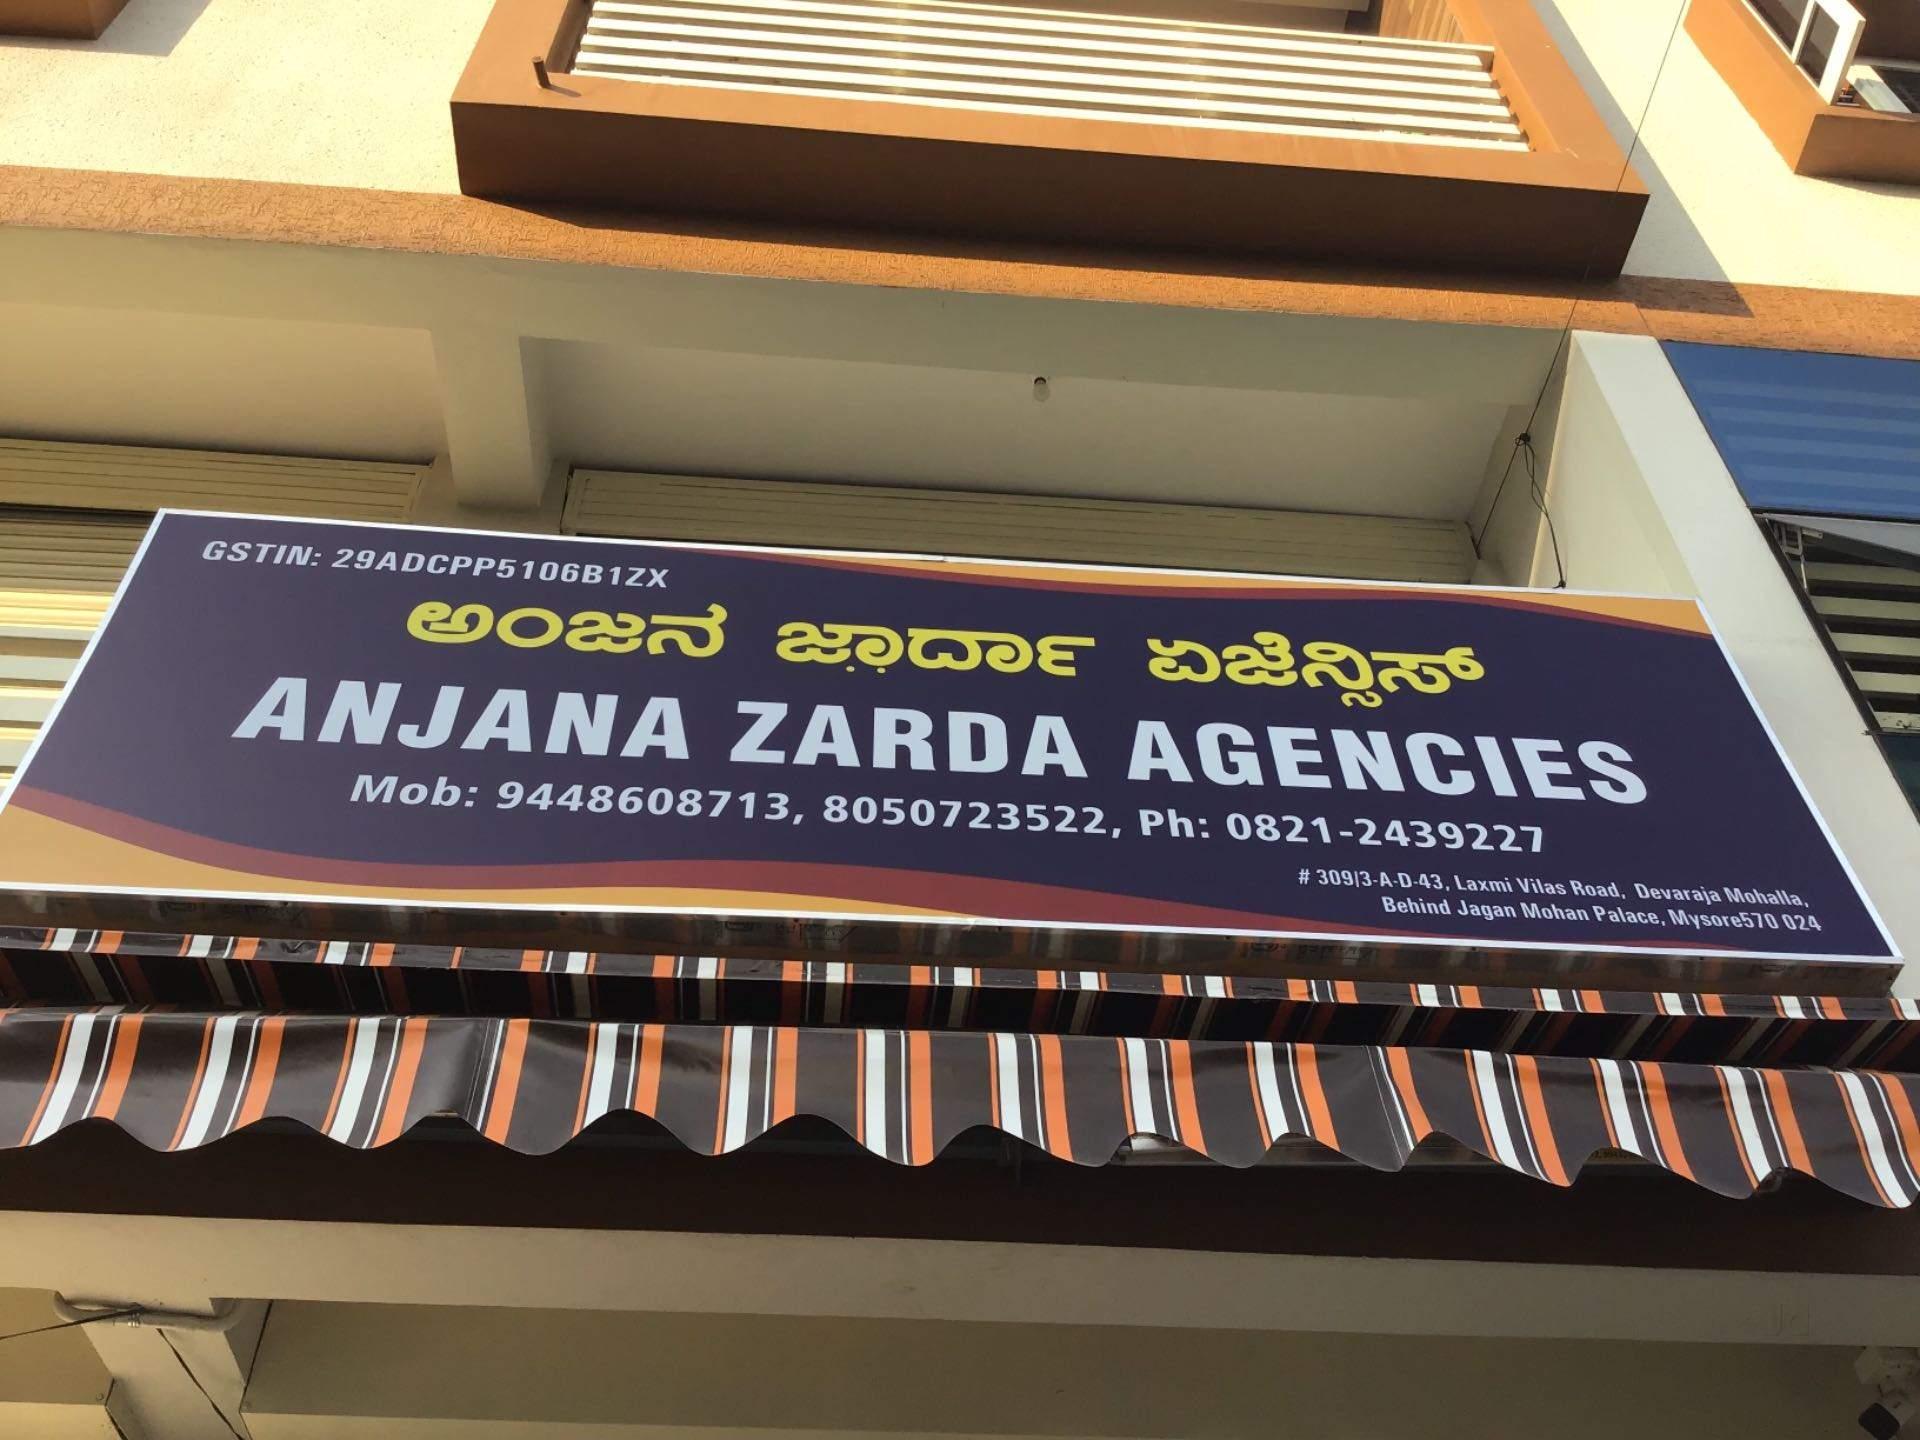 Top Pan Masala Dealers in Mysore - Justdial